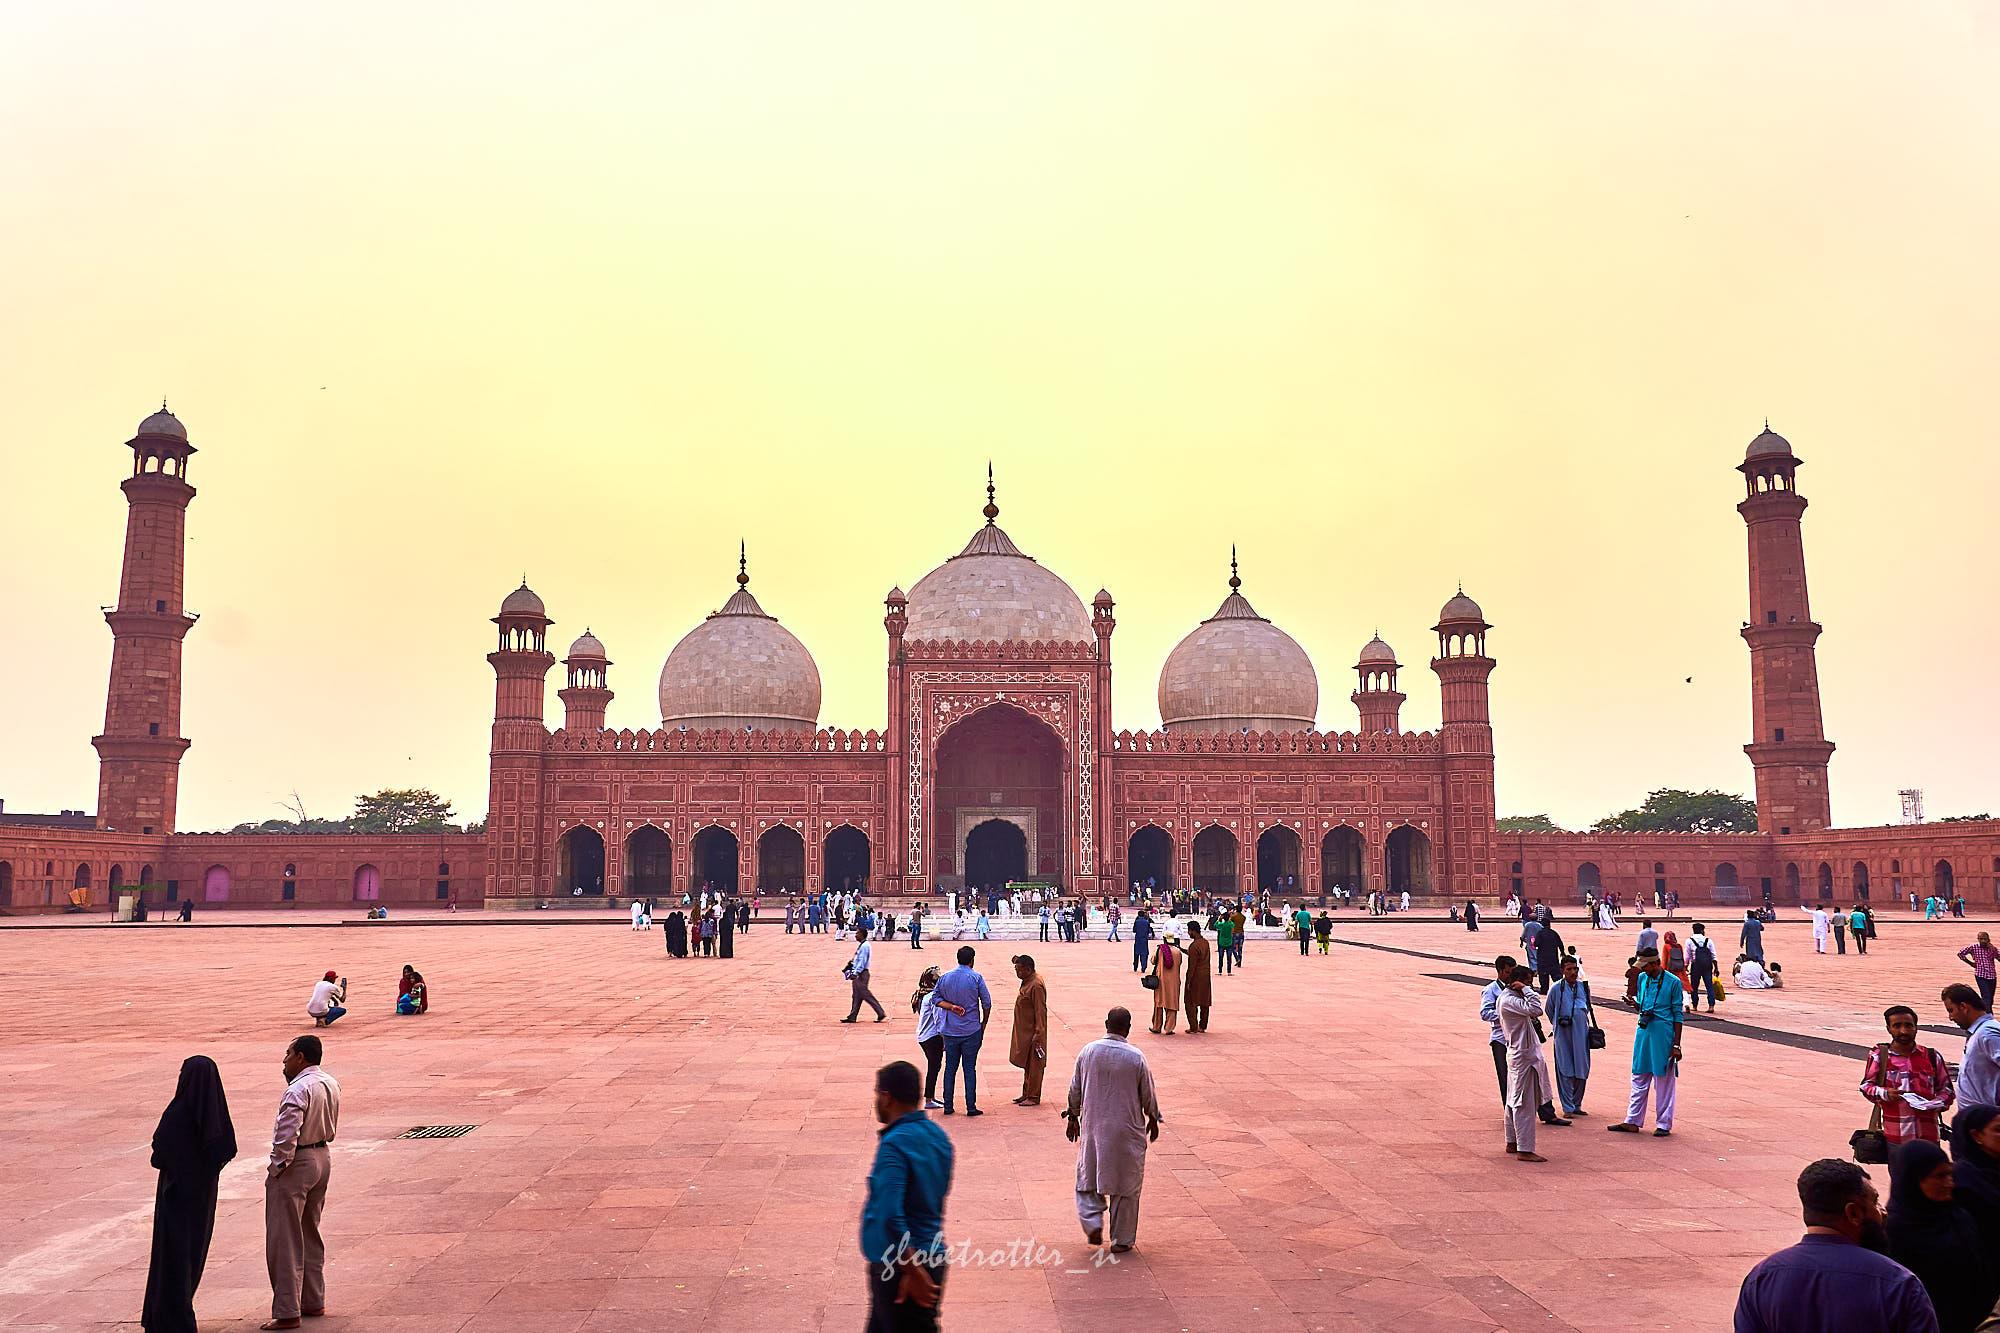 Badshahi Mosque Lahore, Pakistan